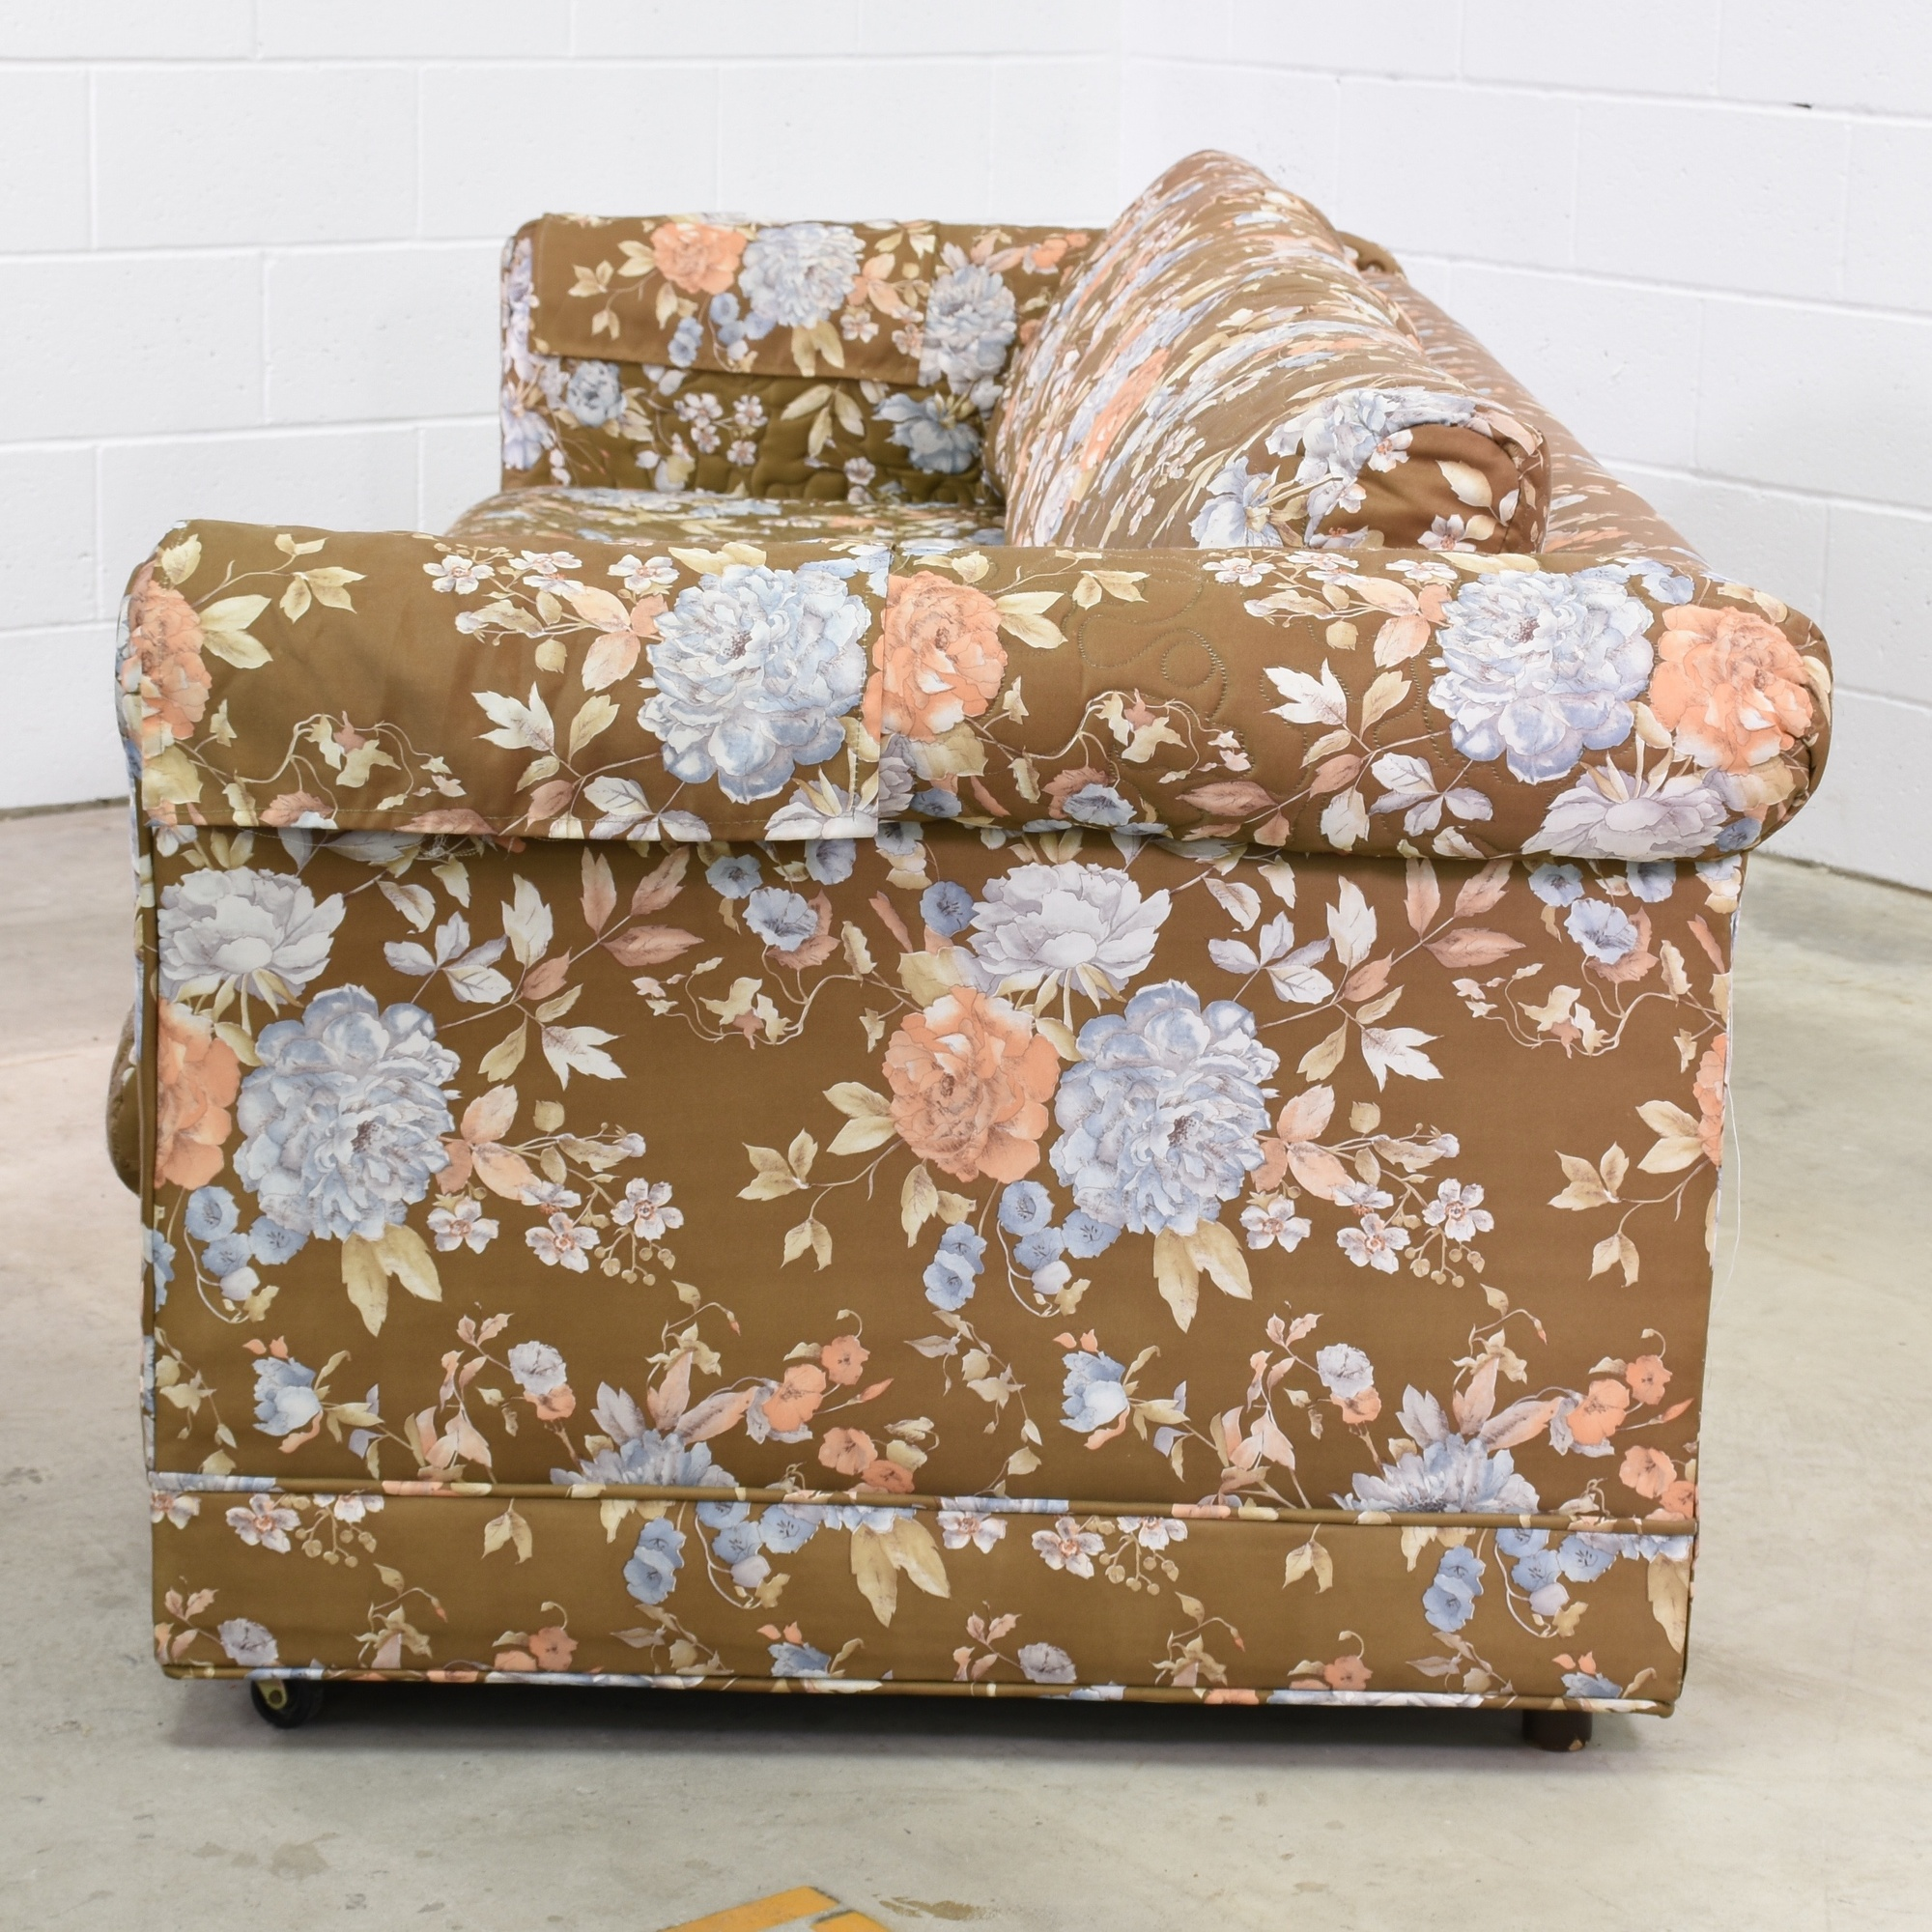 Long Retro Sofa In Brown Floral Print Loveseat Vintage